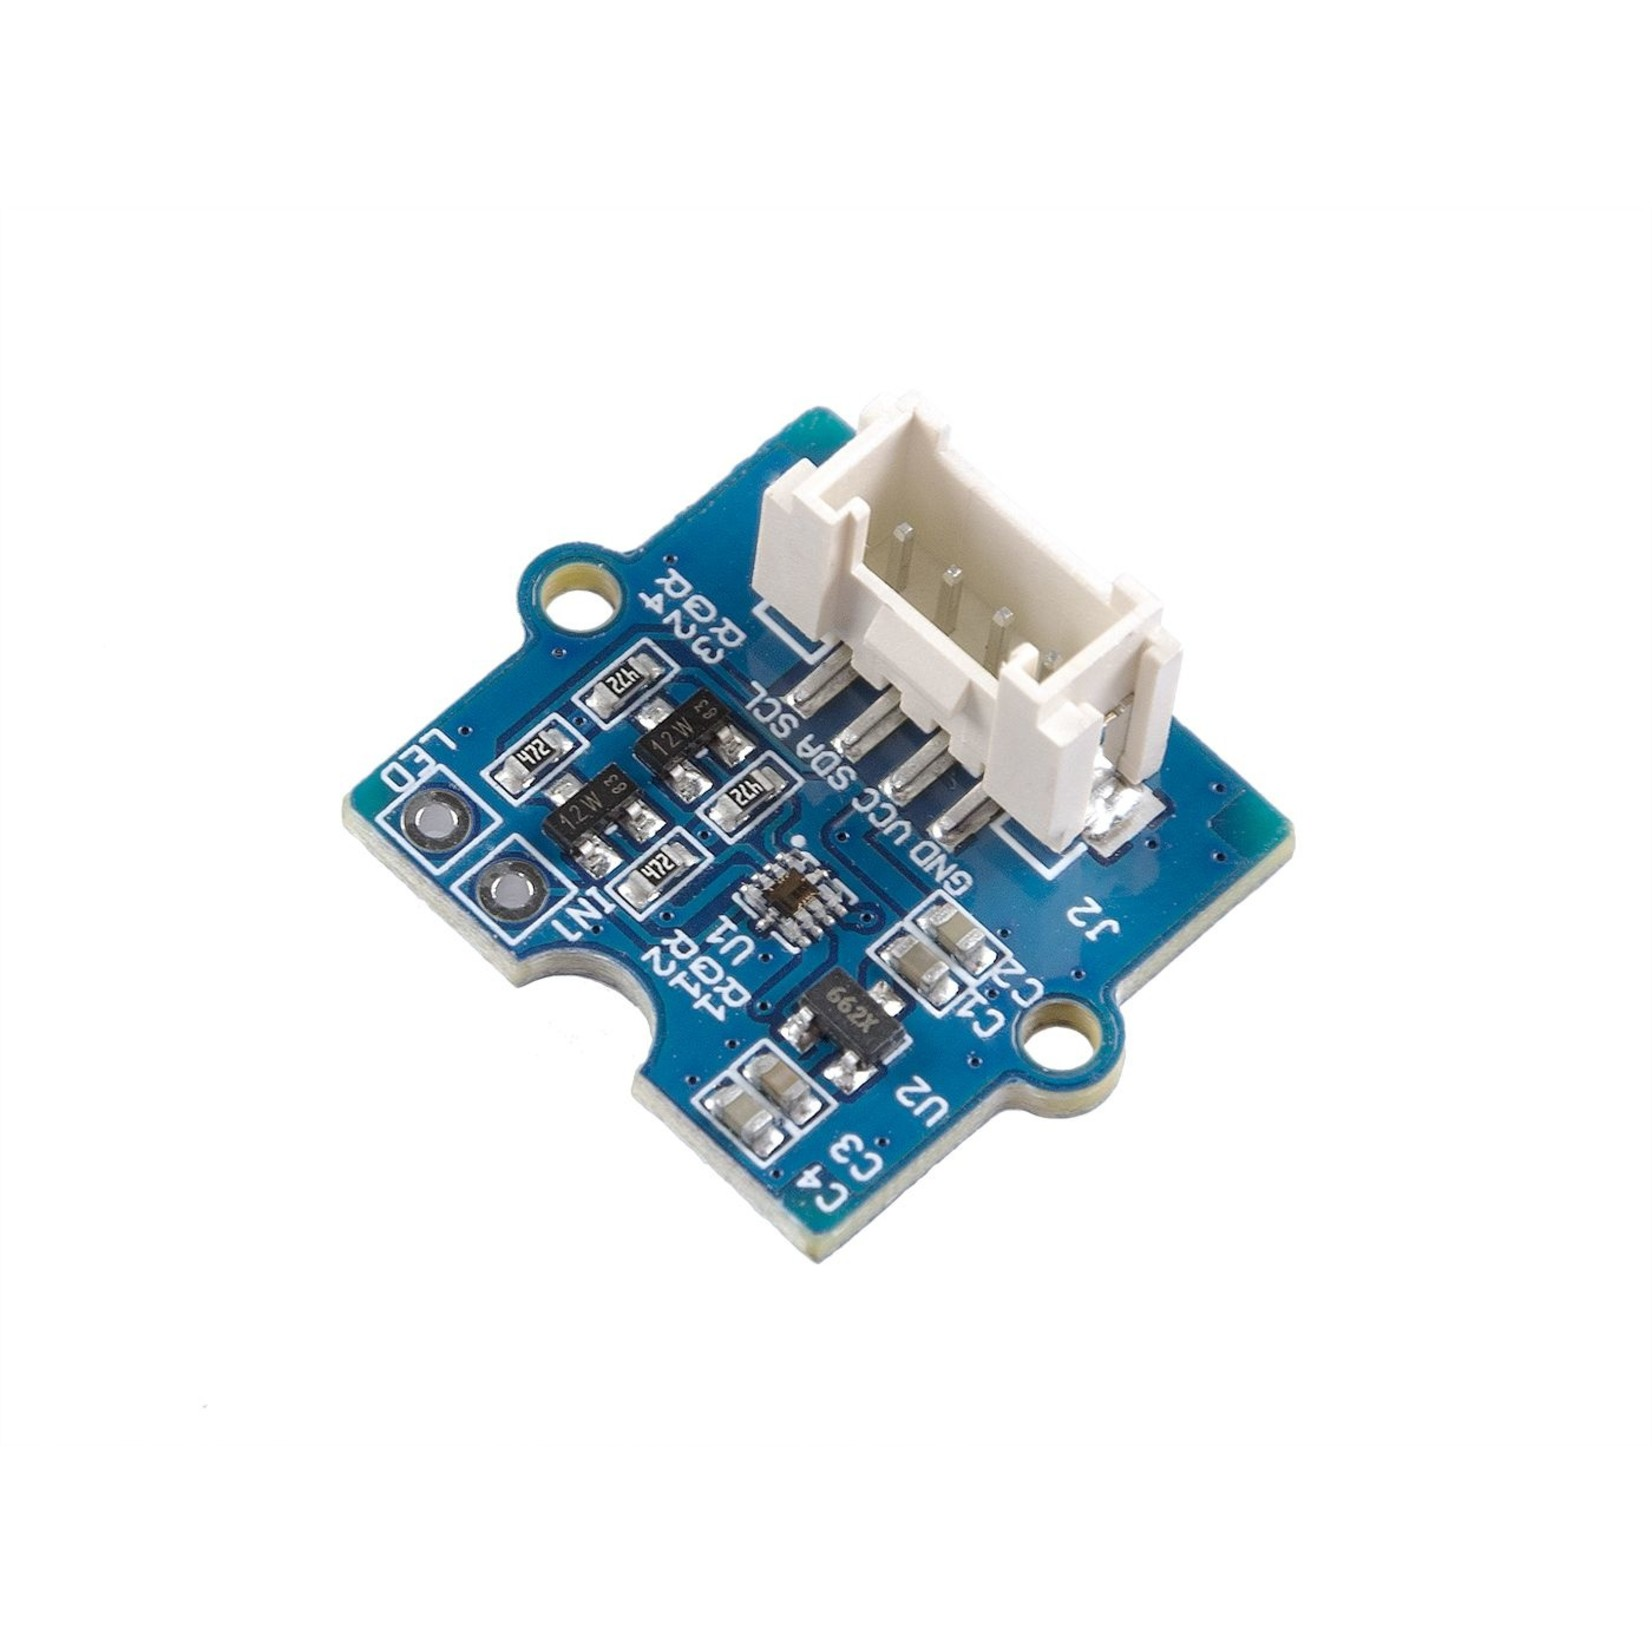 Seeed Grove - Sunlight Sensor